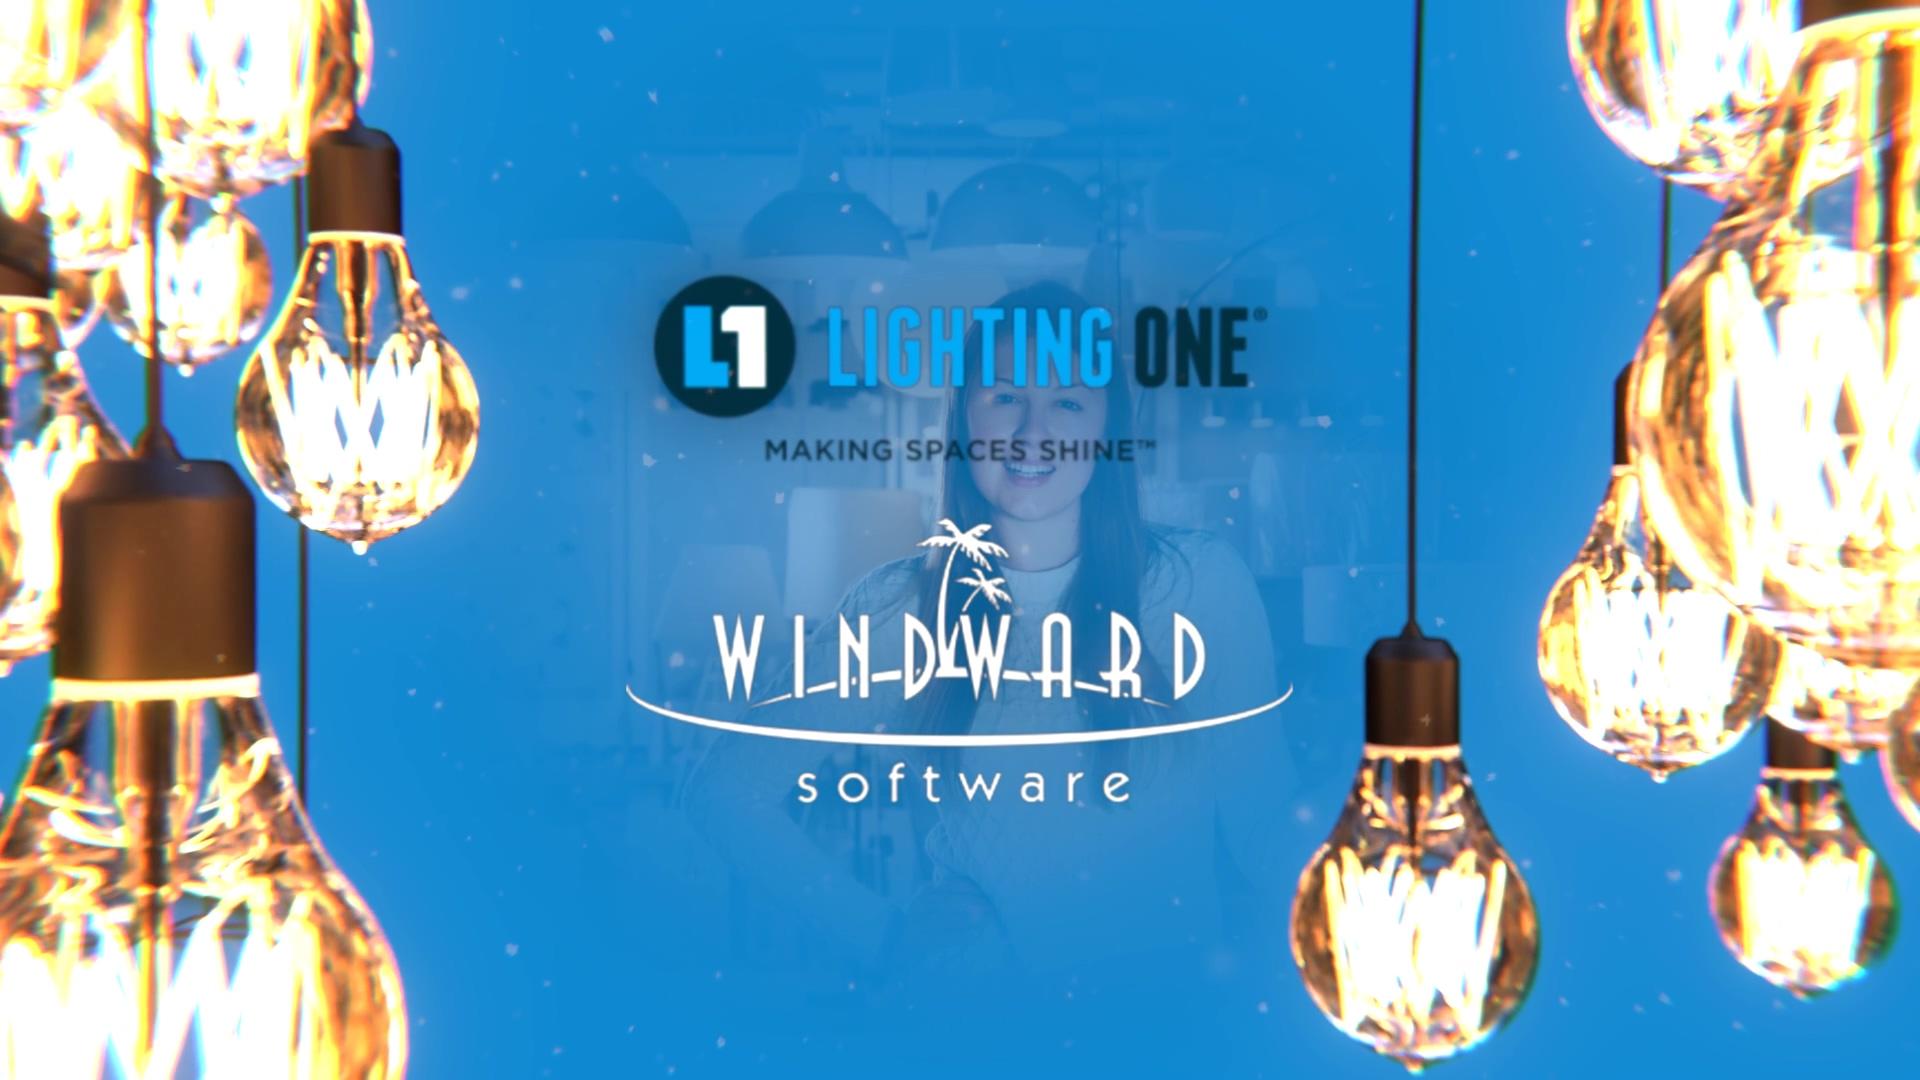 windward-lighting-one-Hanging Lights Intro